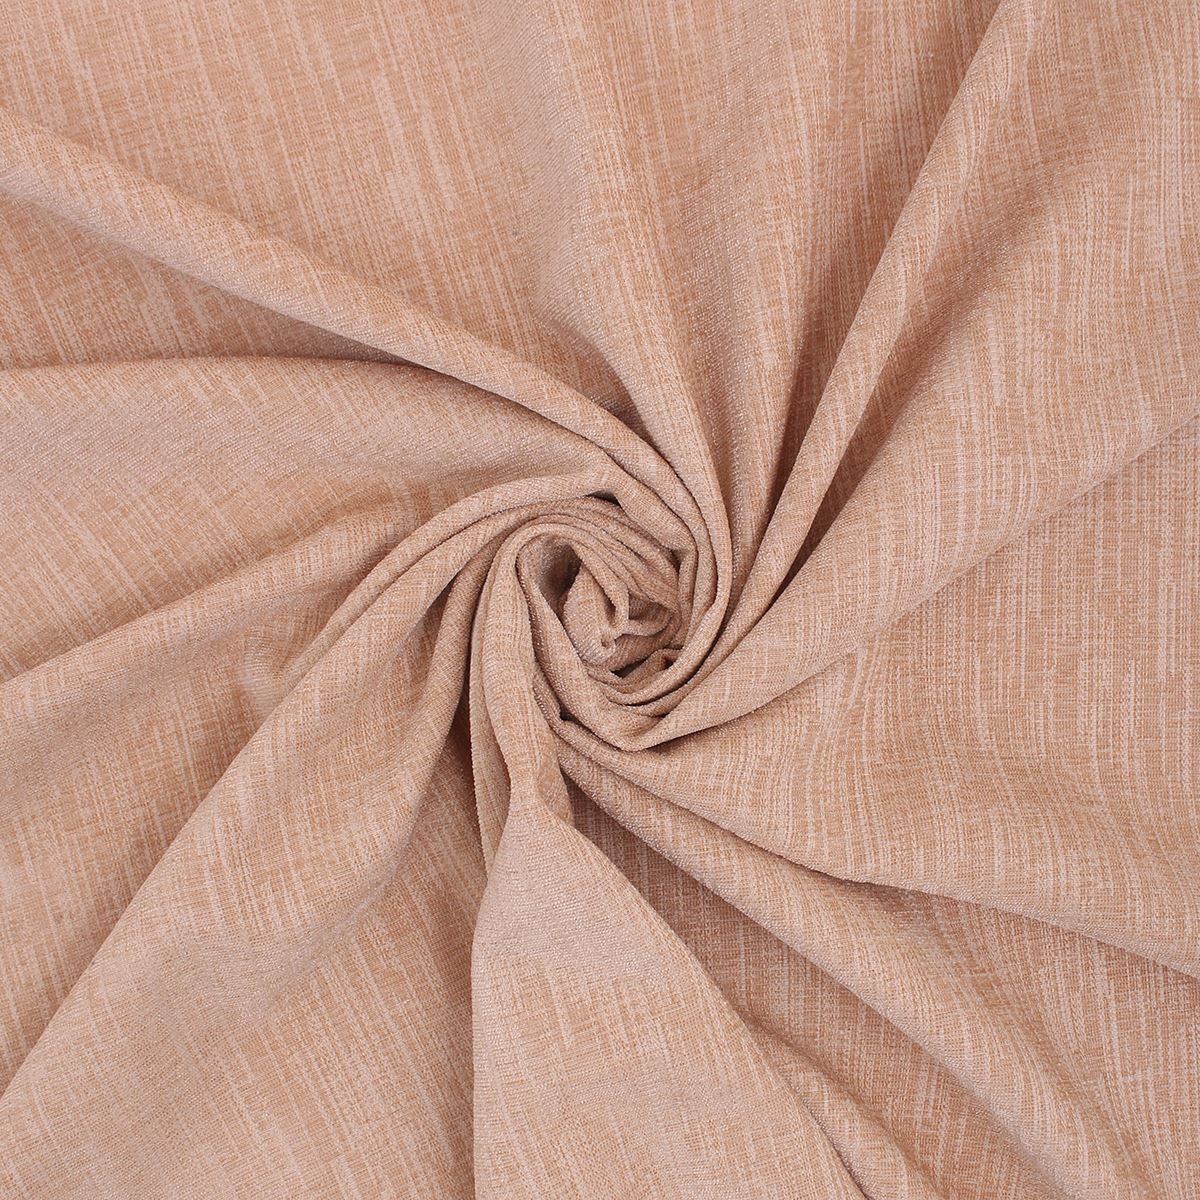 034-Chenille-034-Slubbed-Shabby-Worn-Look-Curtain-Cushion-Sofa-Upholstery-Fabric thumbnail 18